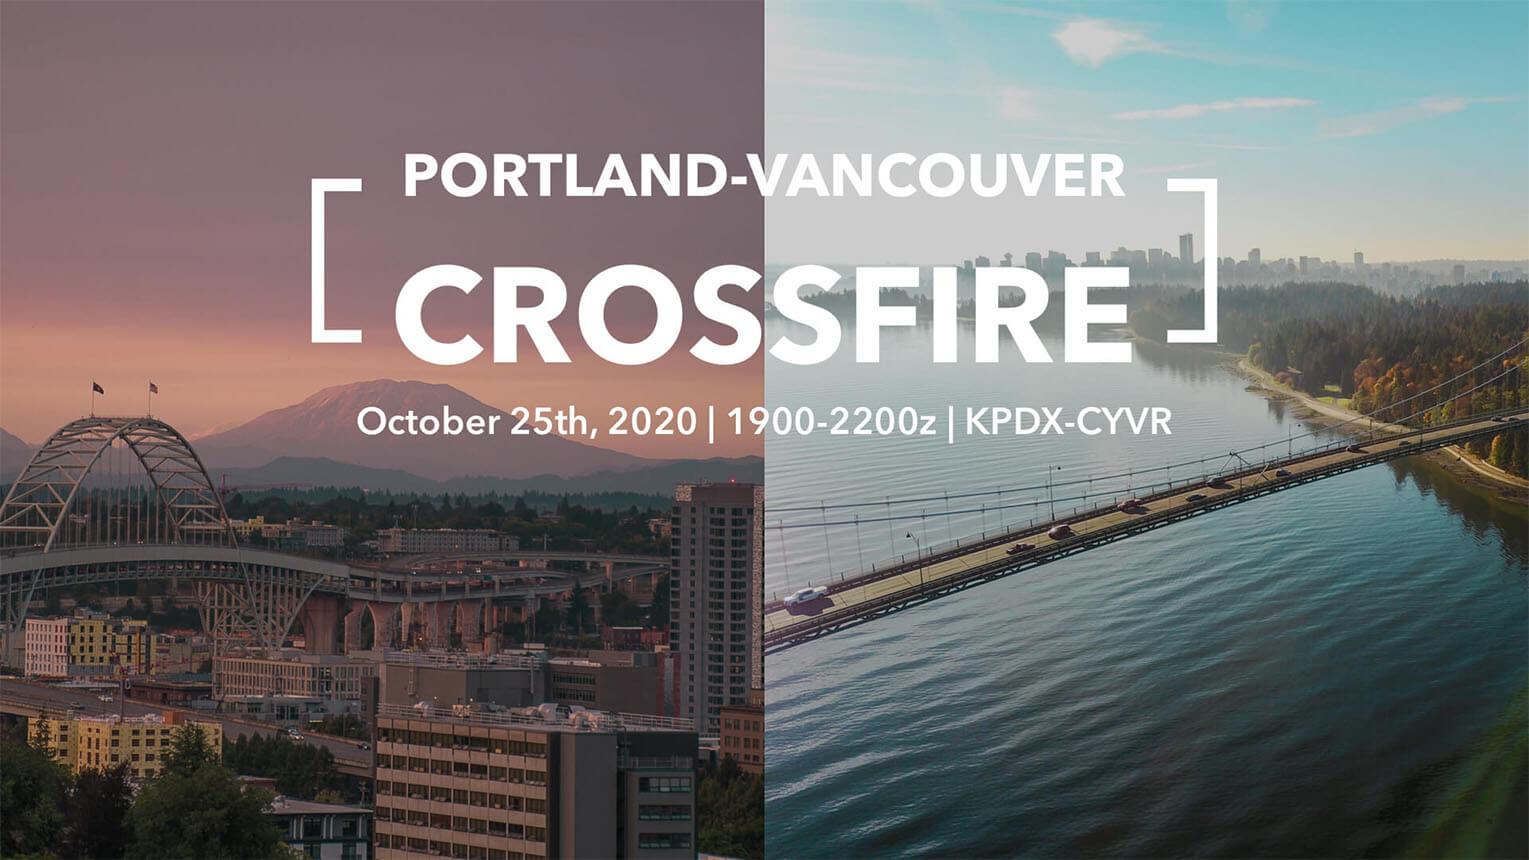 YVR-PDX Crossfire